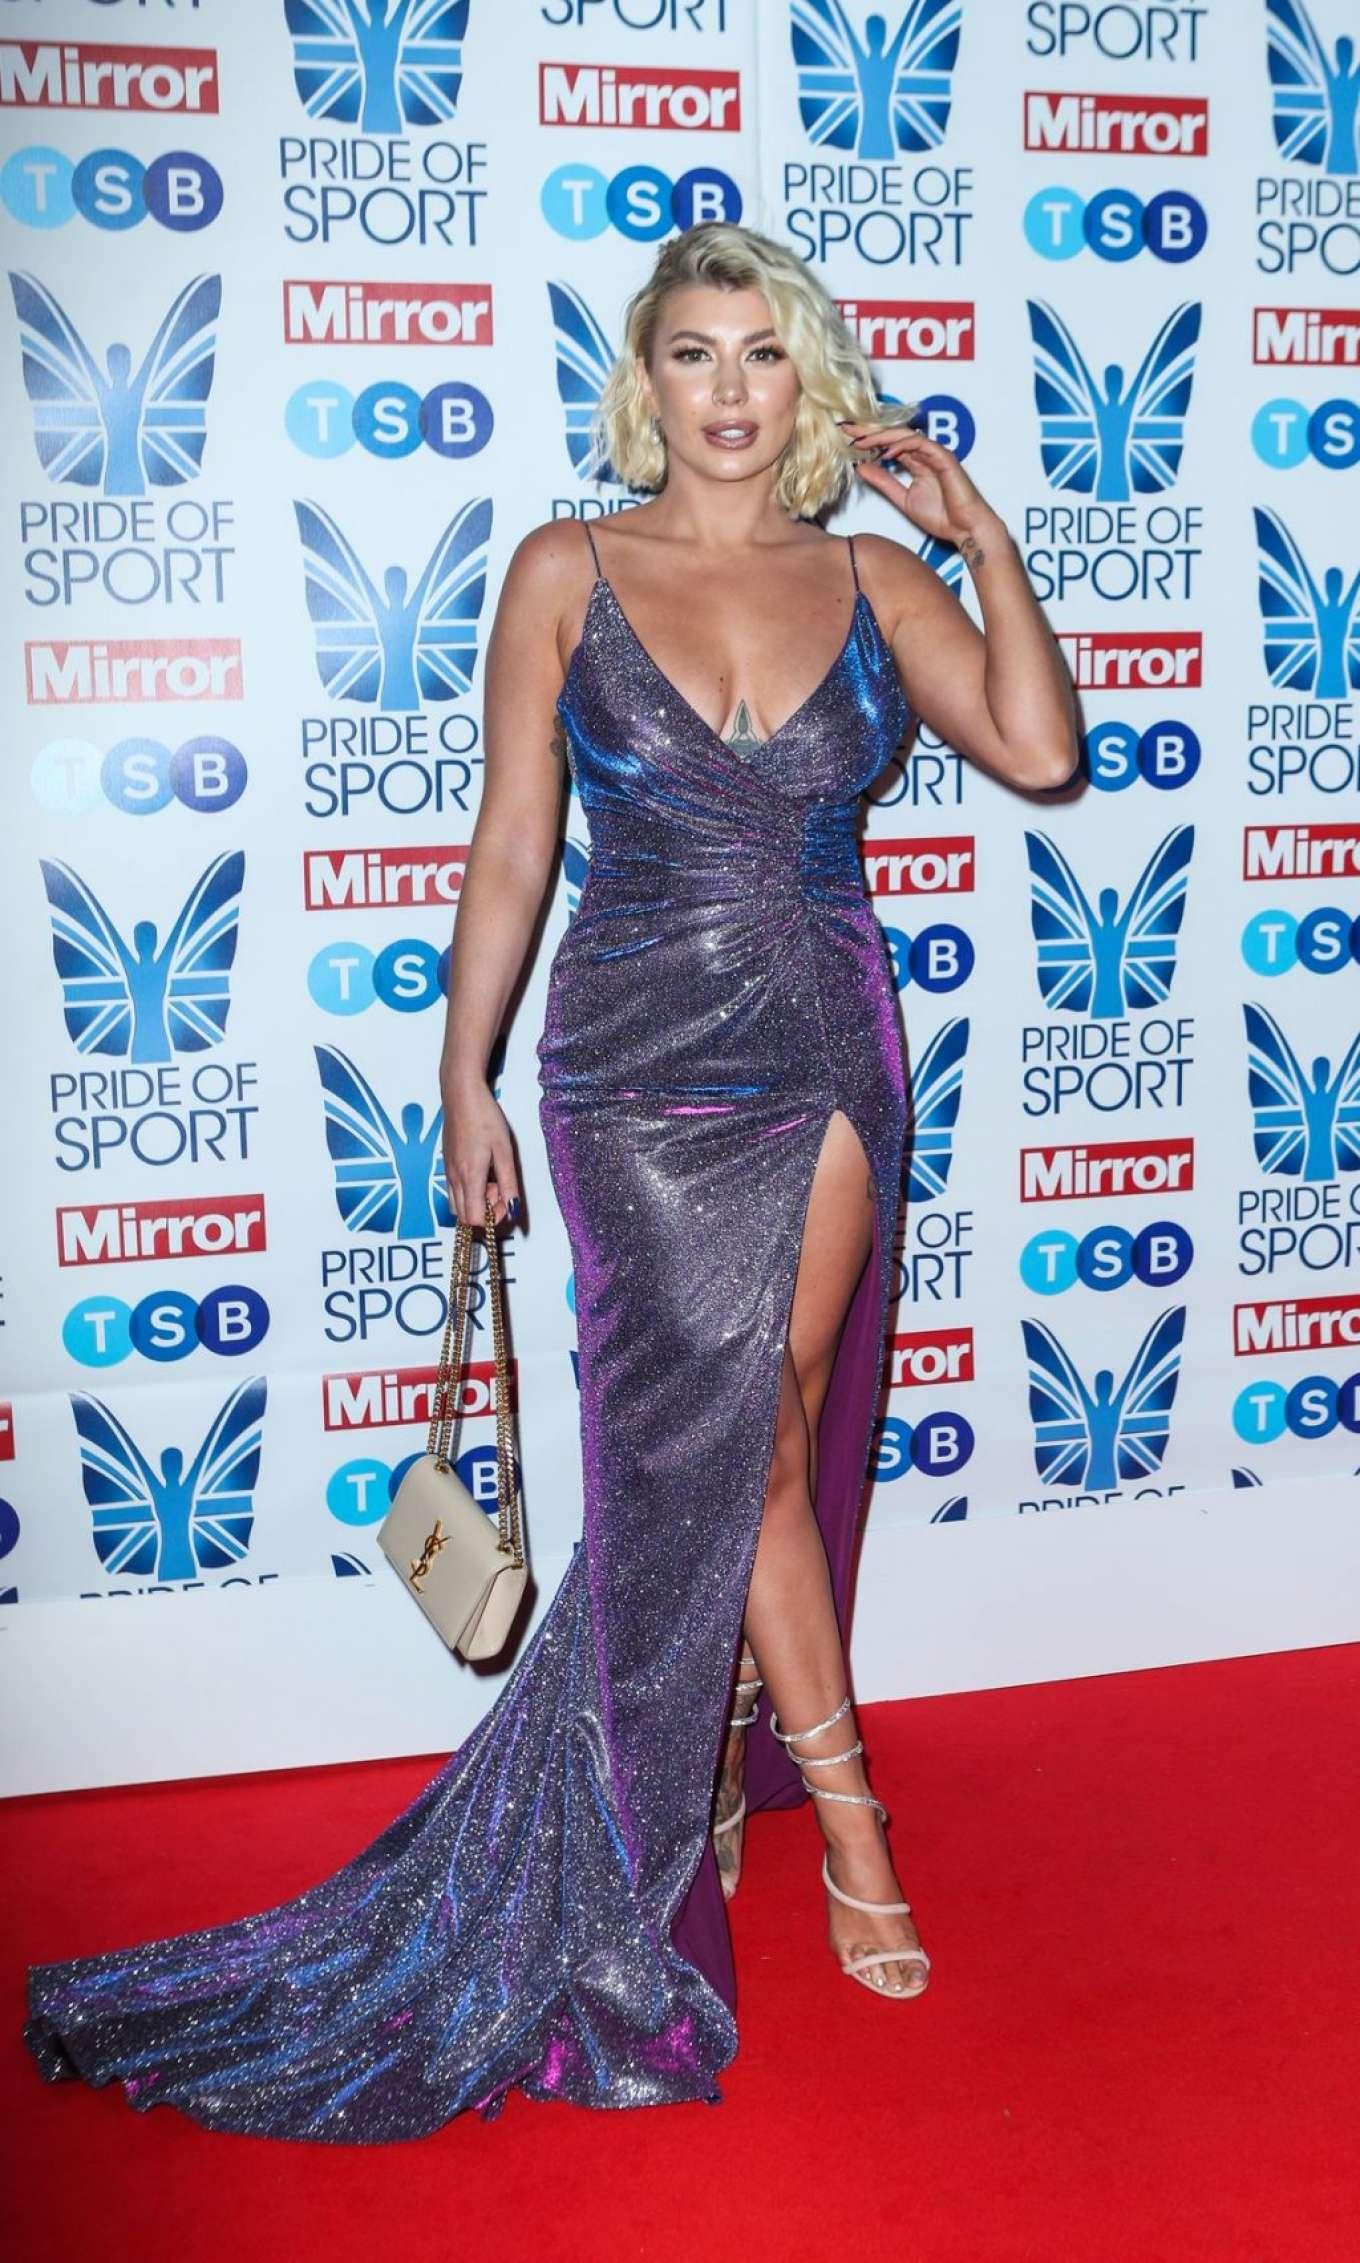 Olivia Buckland 2019 : Olivia Buckland – 2019 Daily Mirror Pride of Sport Awards-28